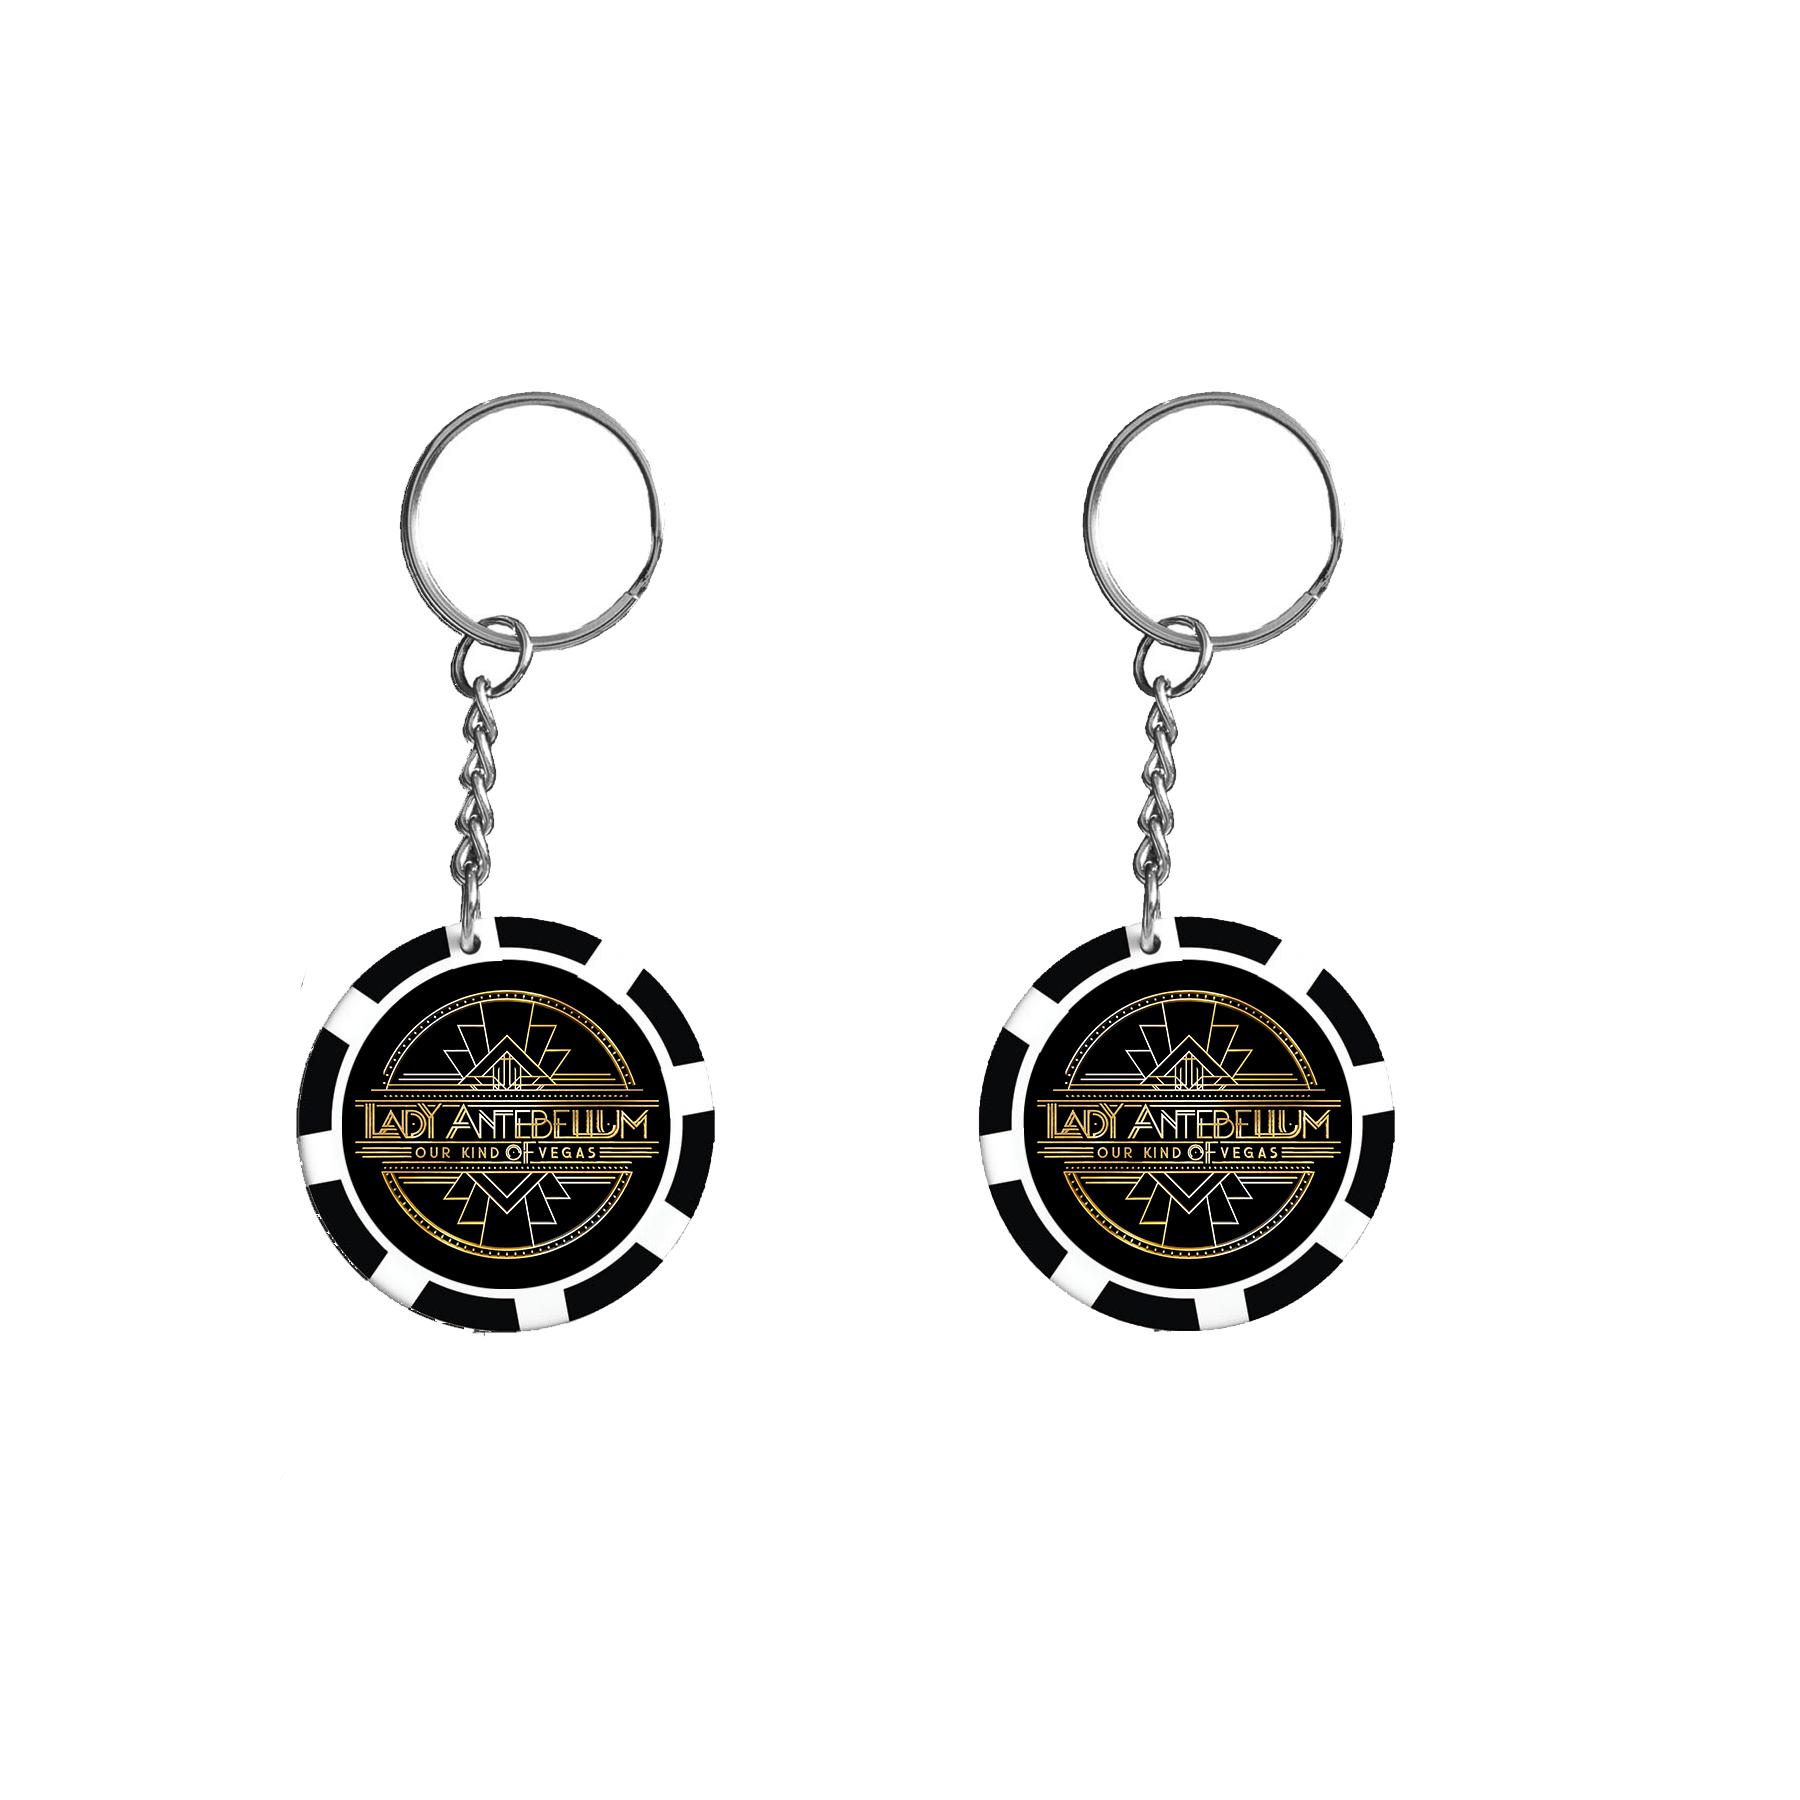 Lady Antebellum - Poker Keychain